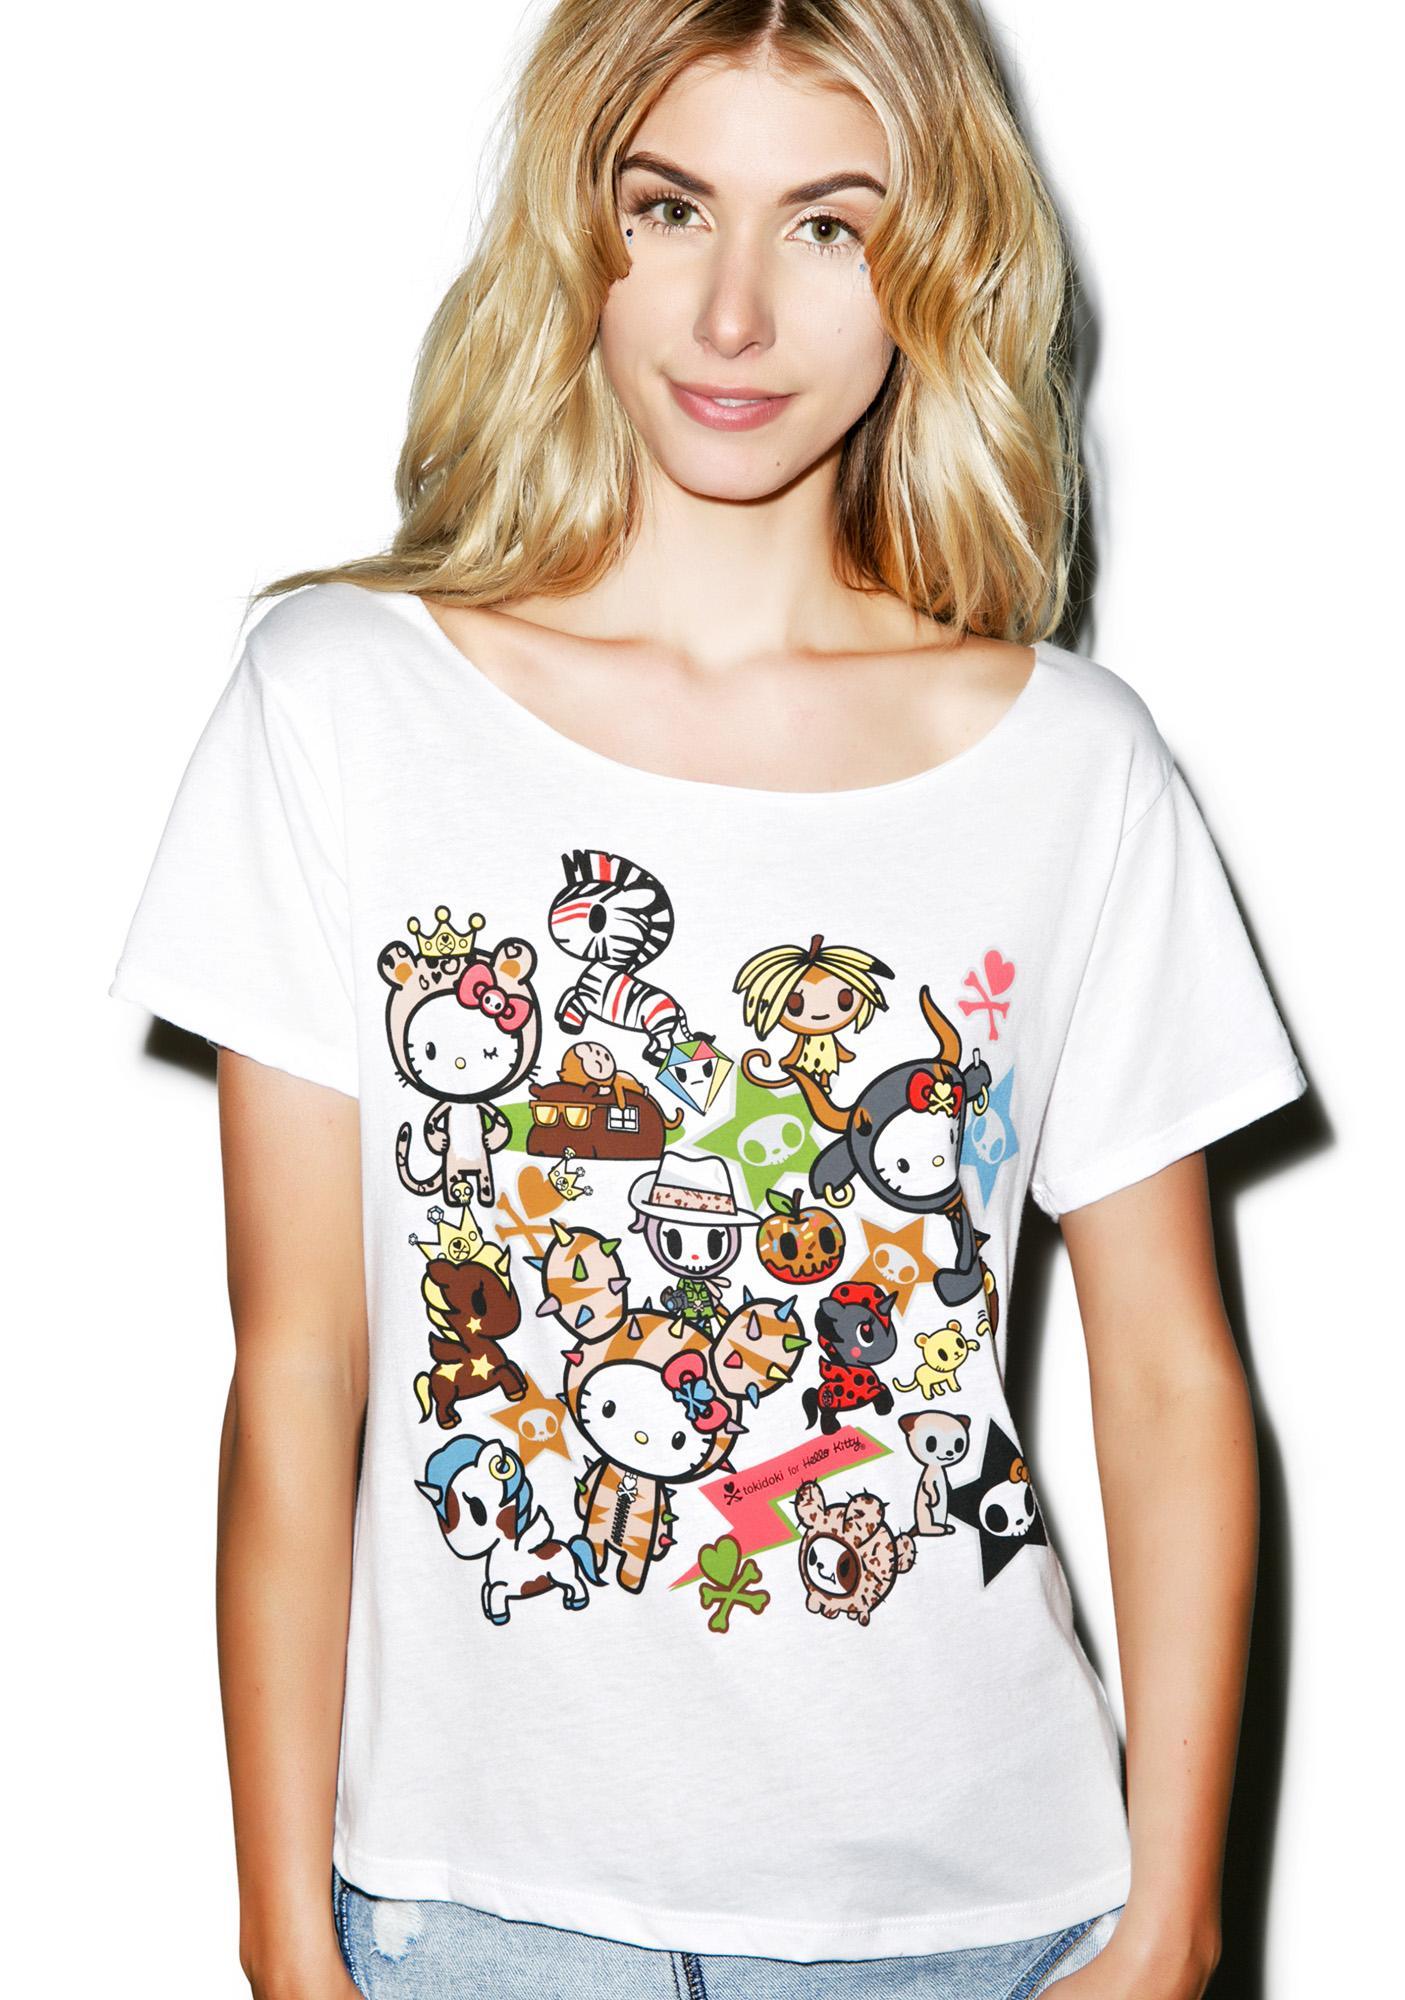 Sanrio Tokidoki X Hello Kitty Safari Off Shoulder Top